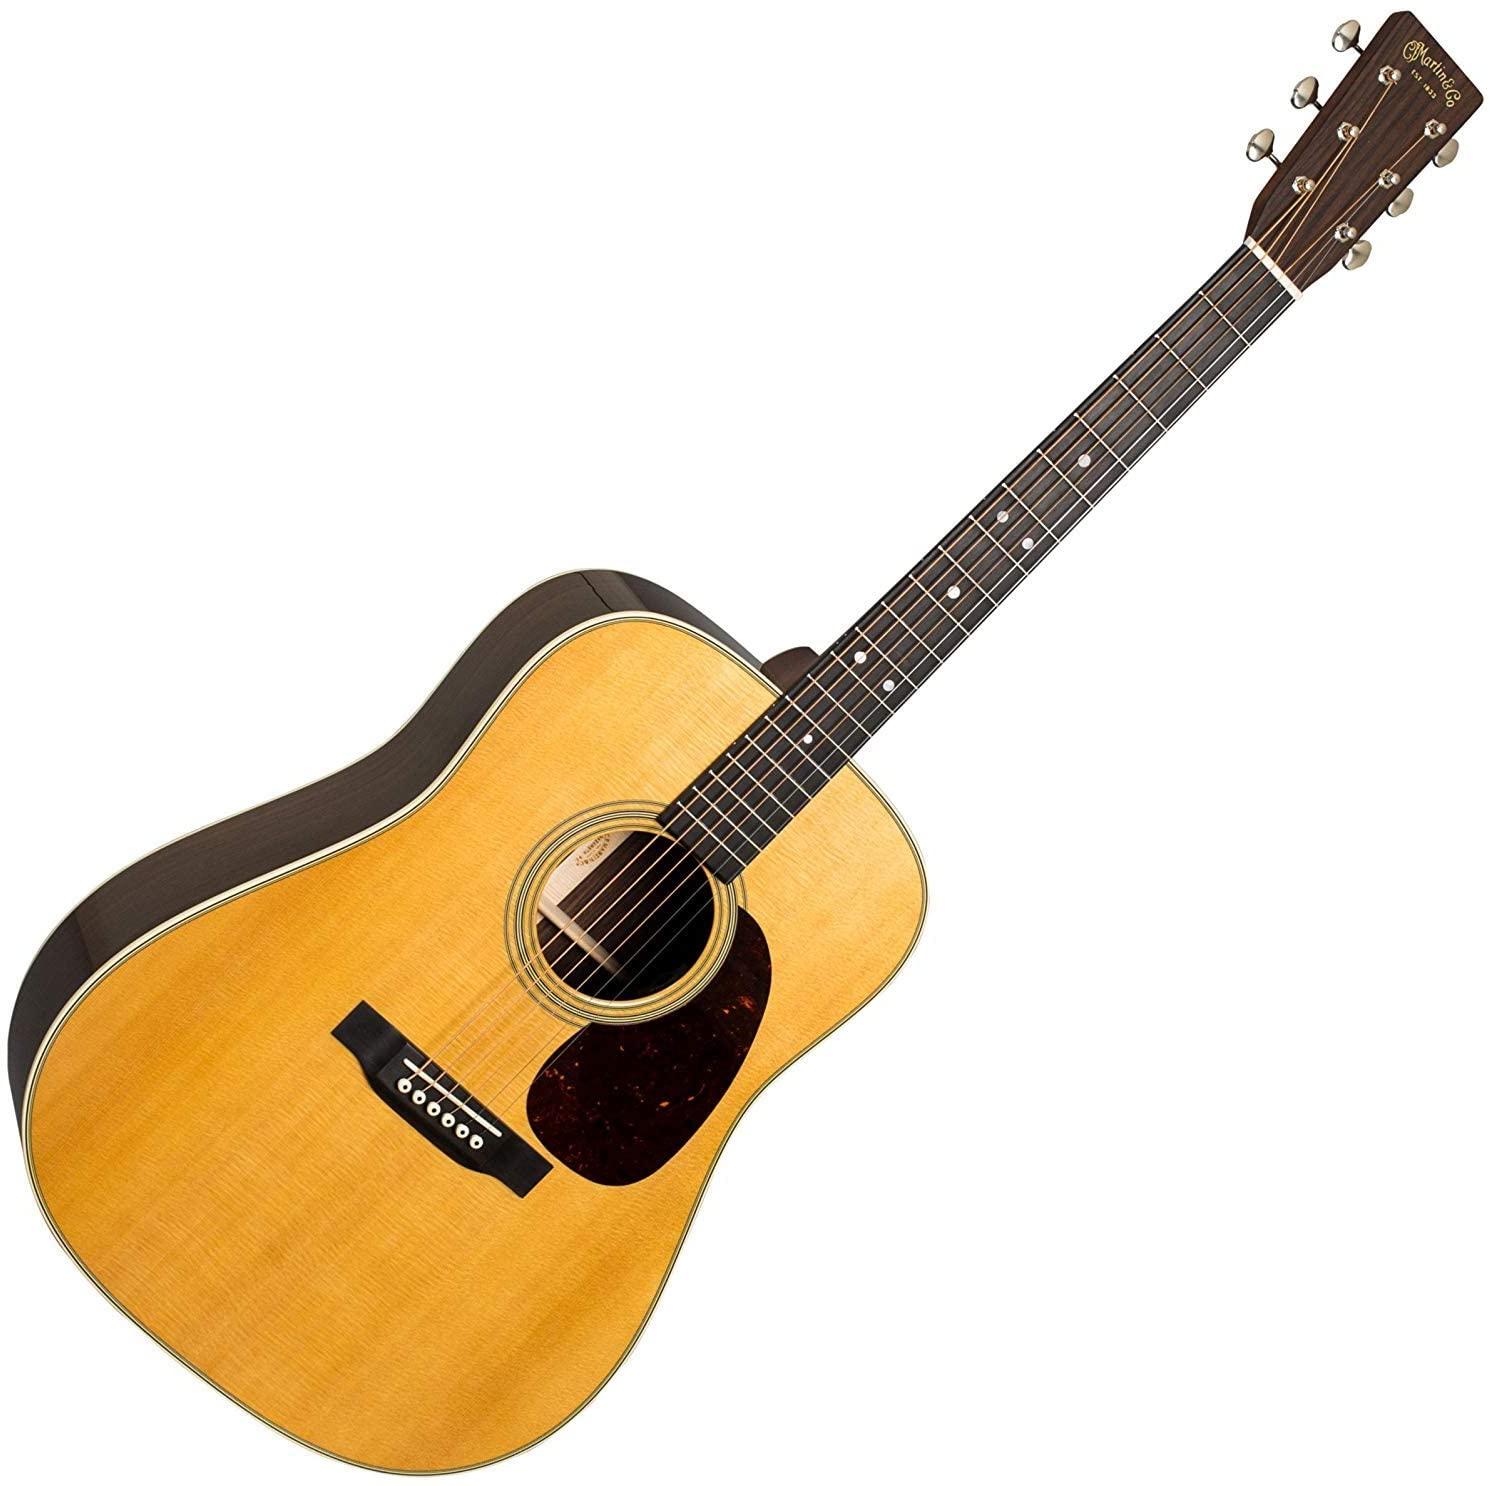 Martin D-28 (2017) Dreadnought Acoustic Guitar